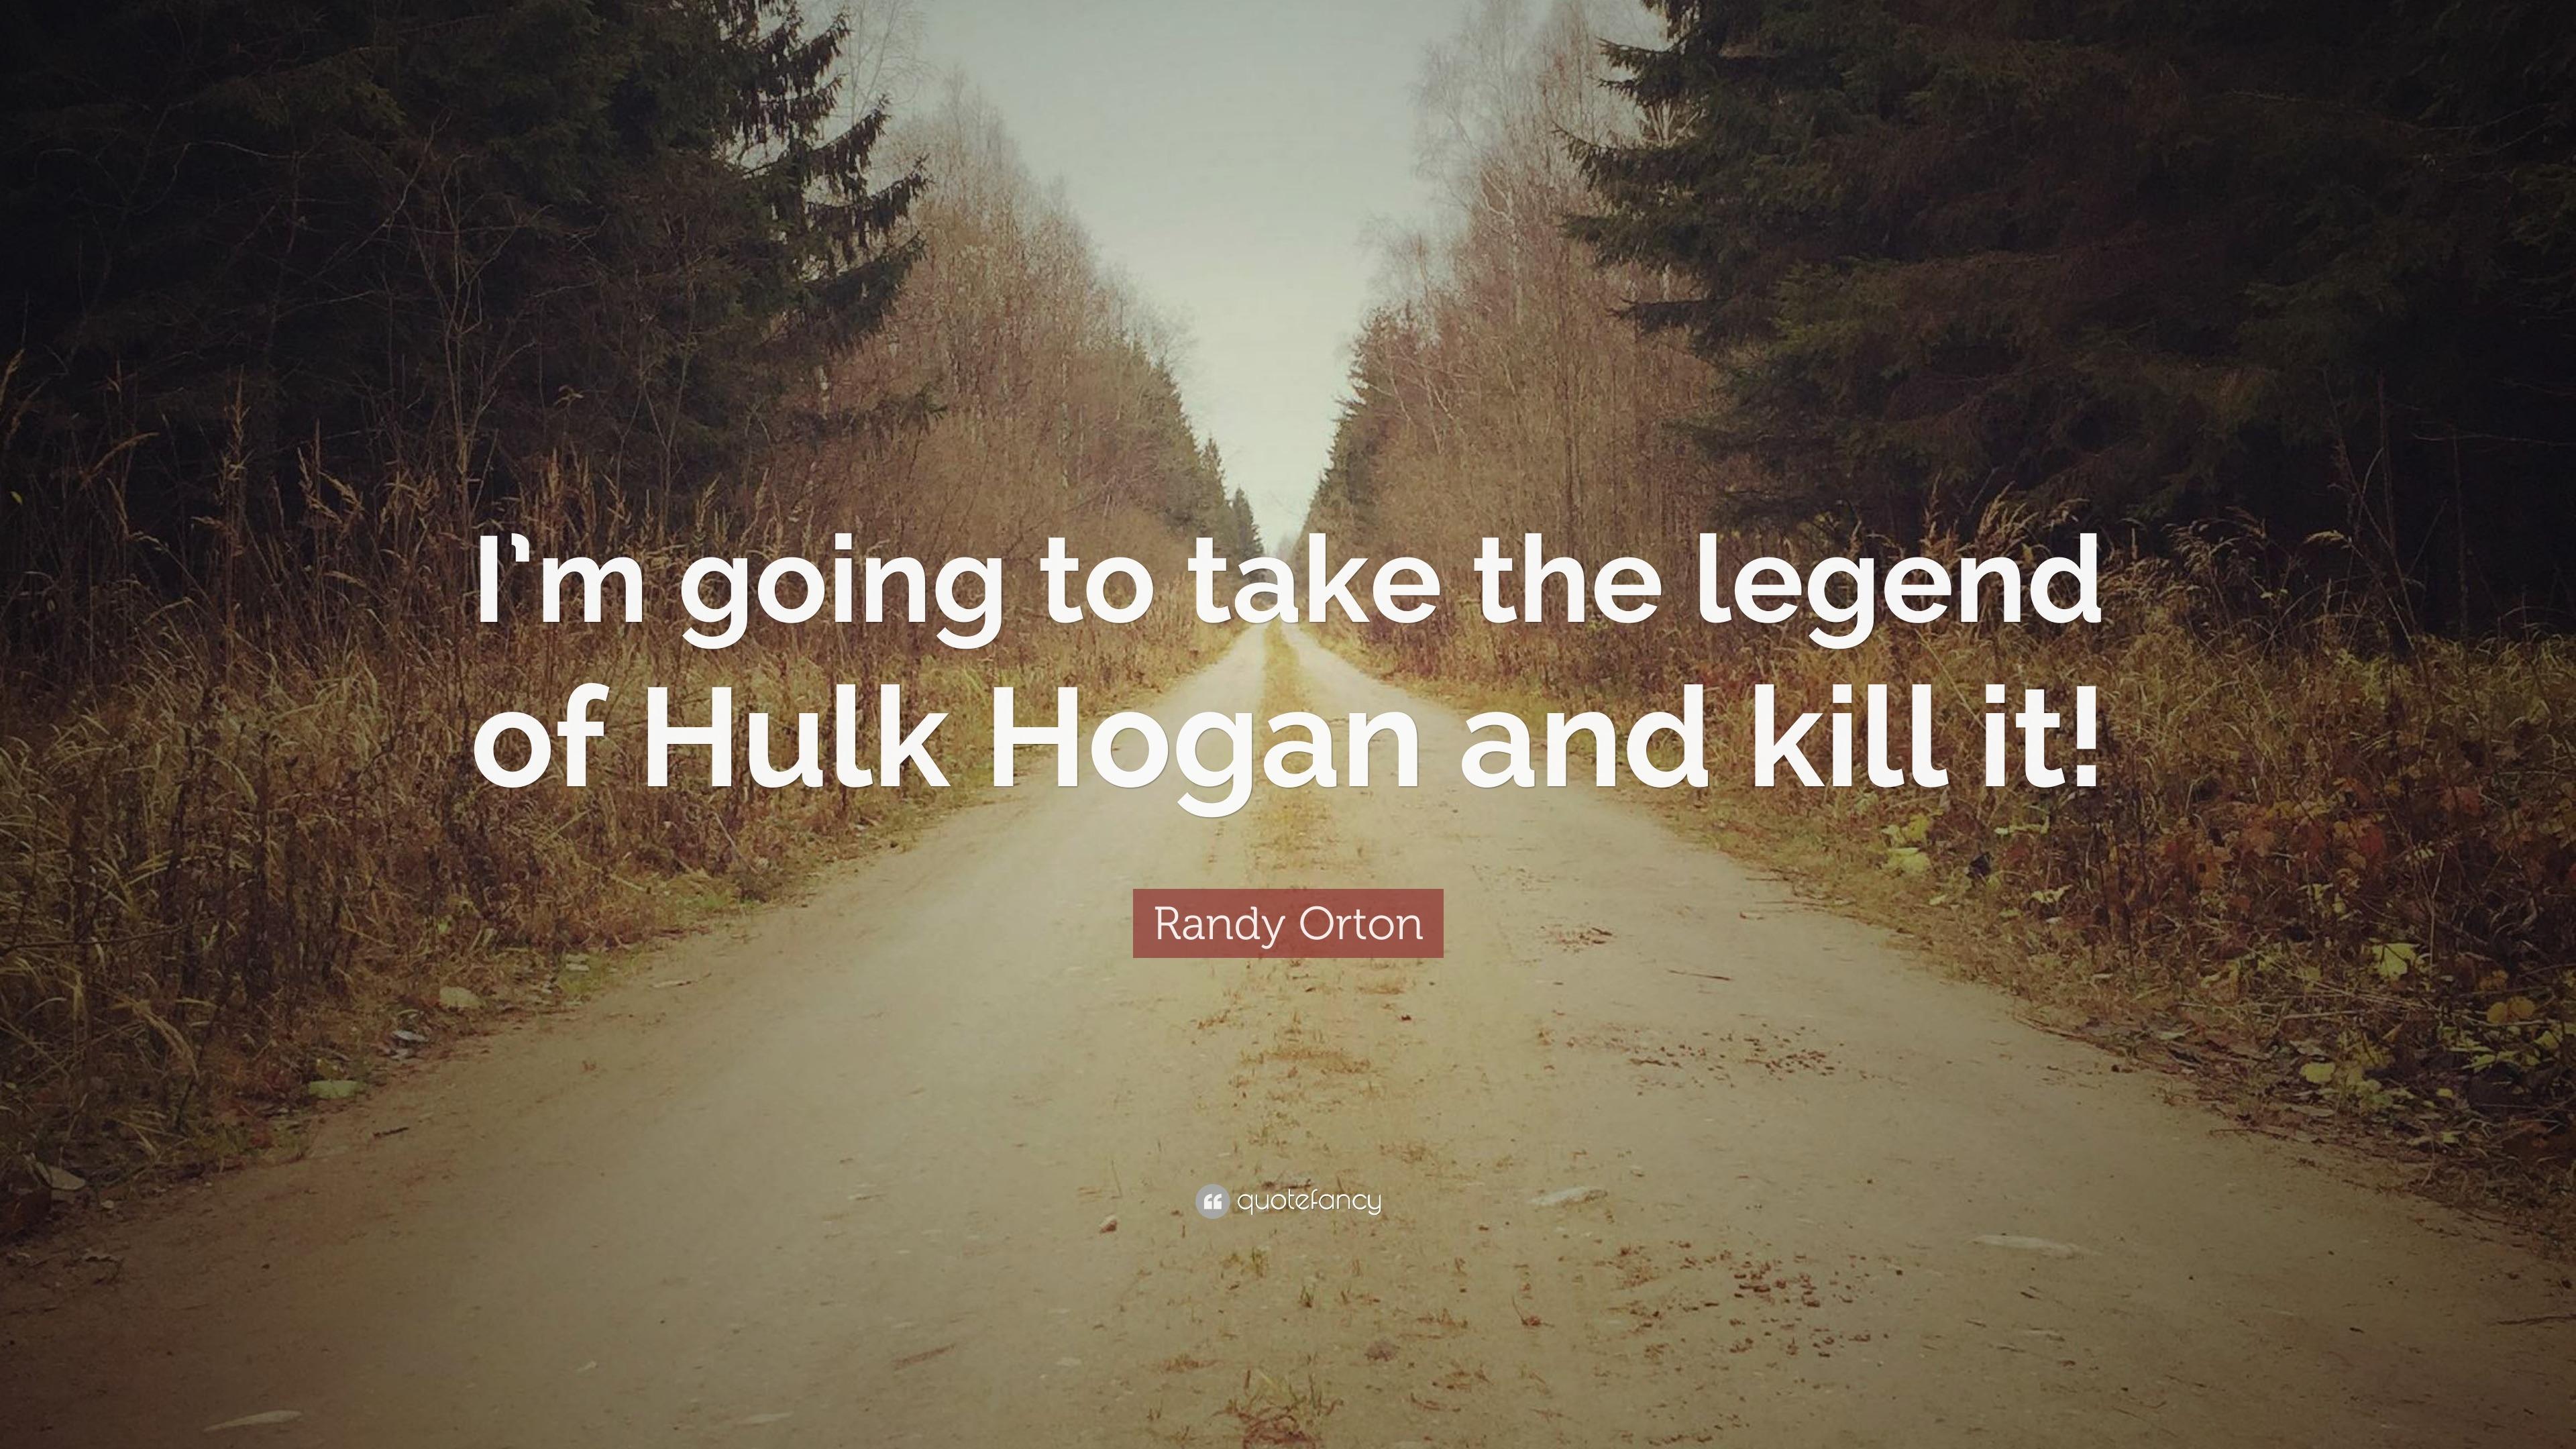 Randy orton hulk hogan-5657